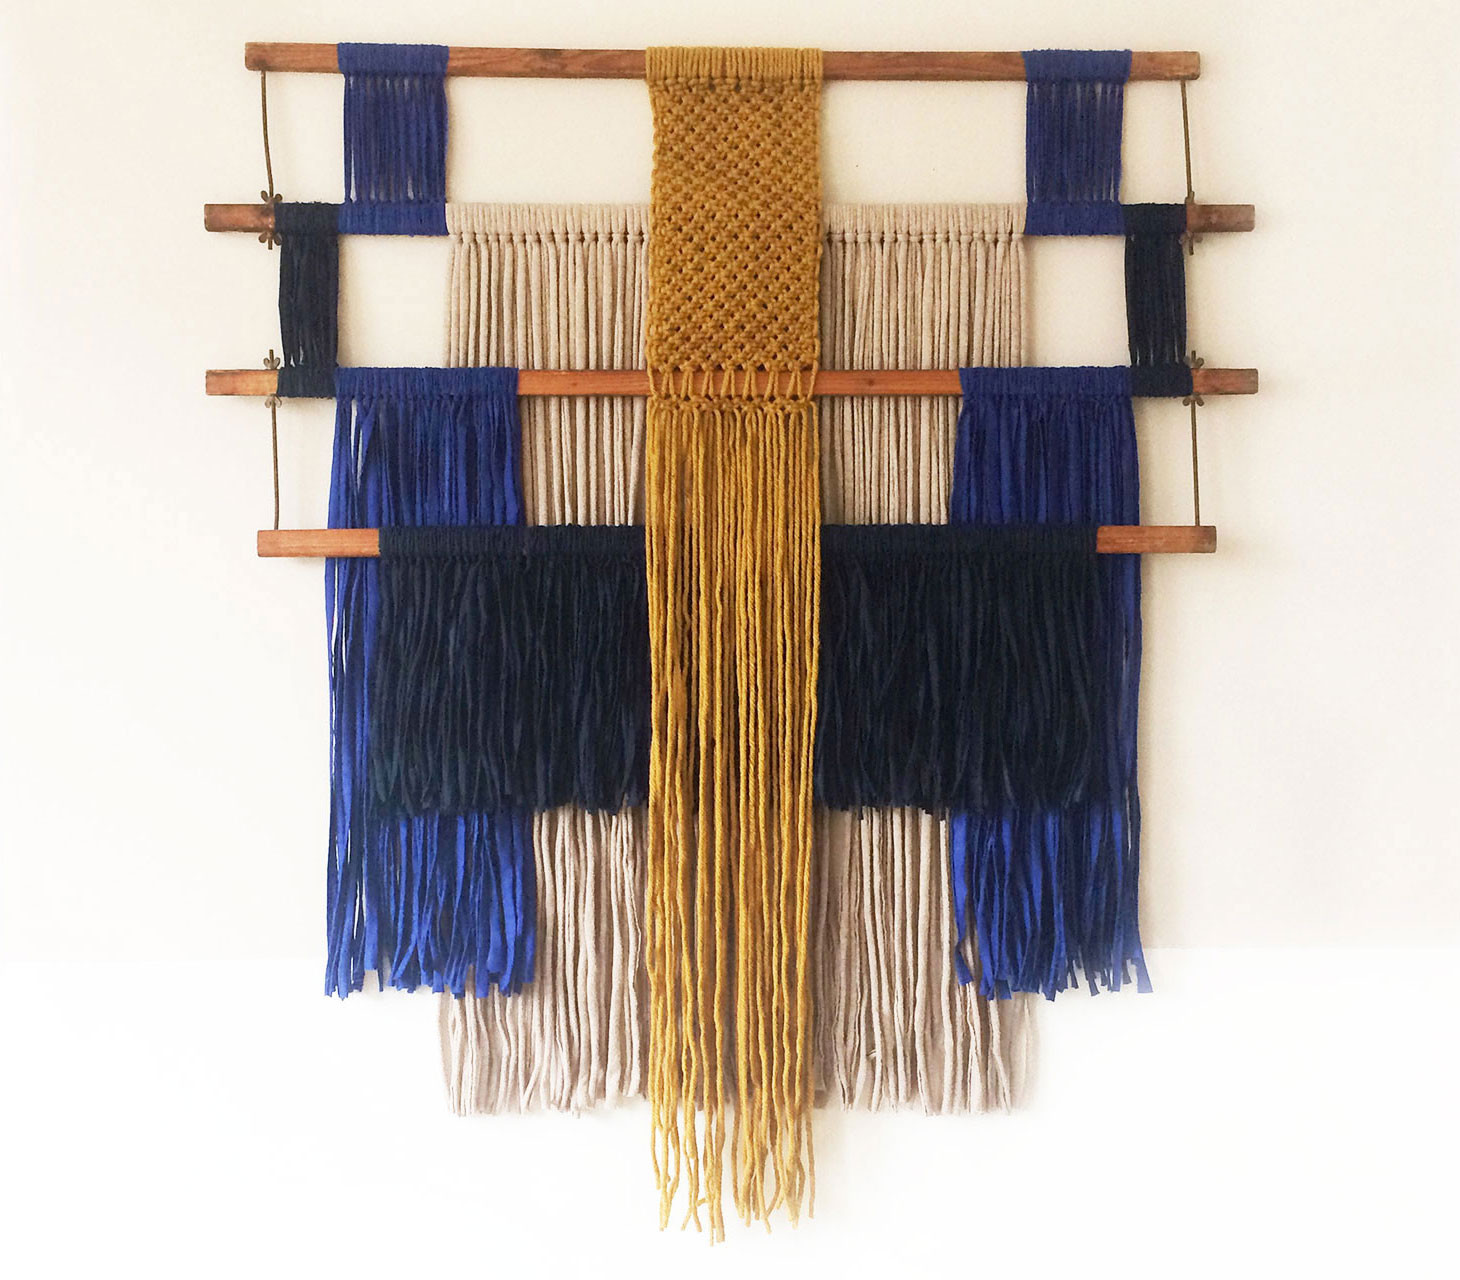 wallhanging_macrame_weaving_loom_fabric